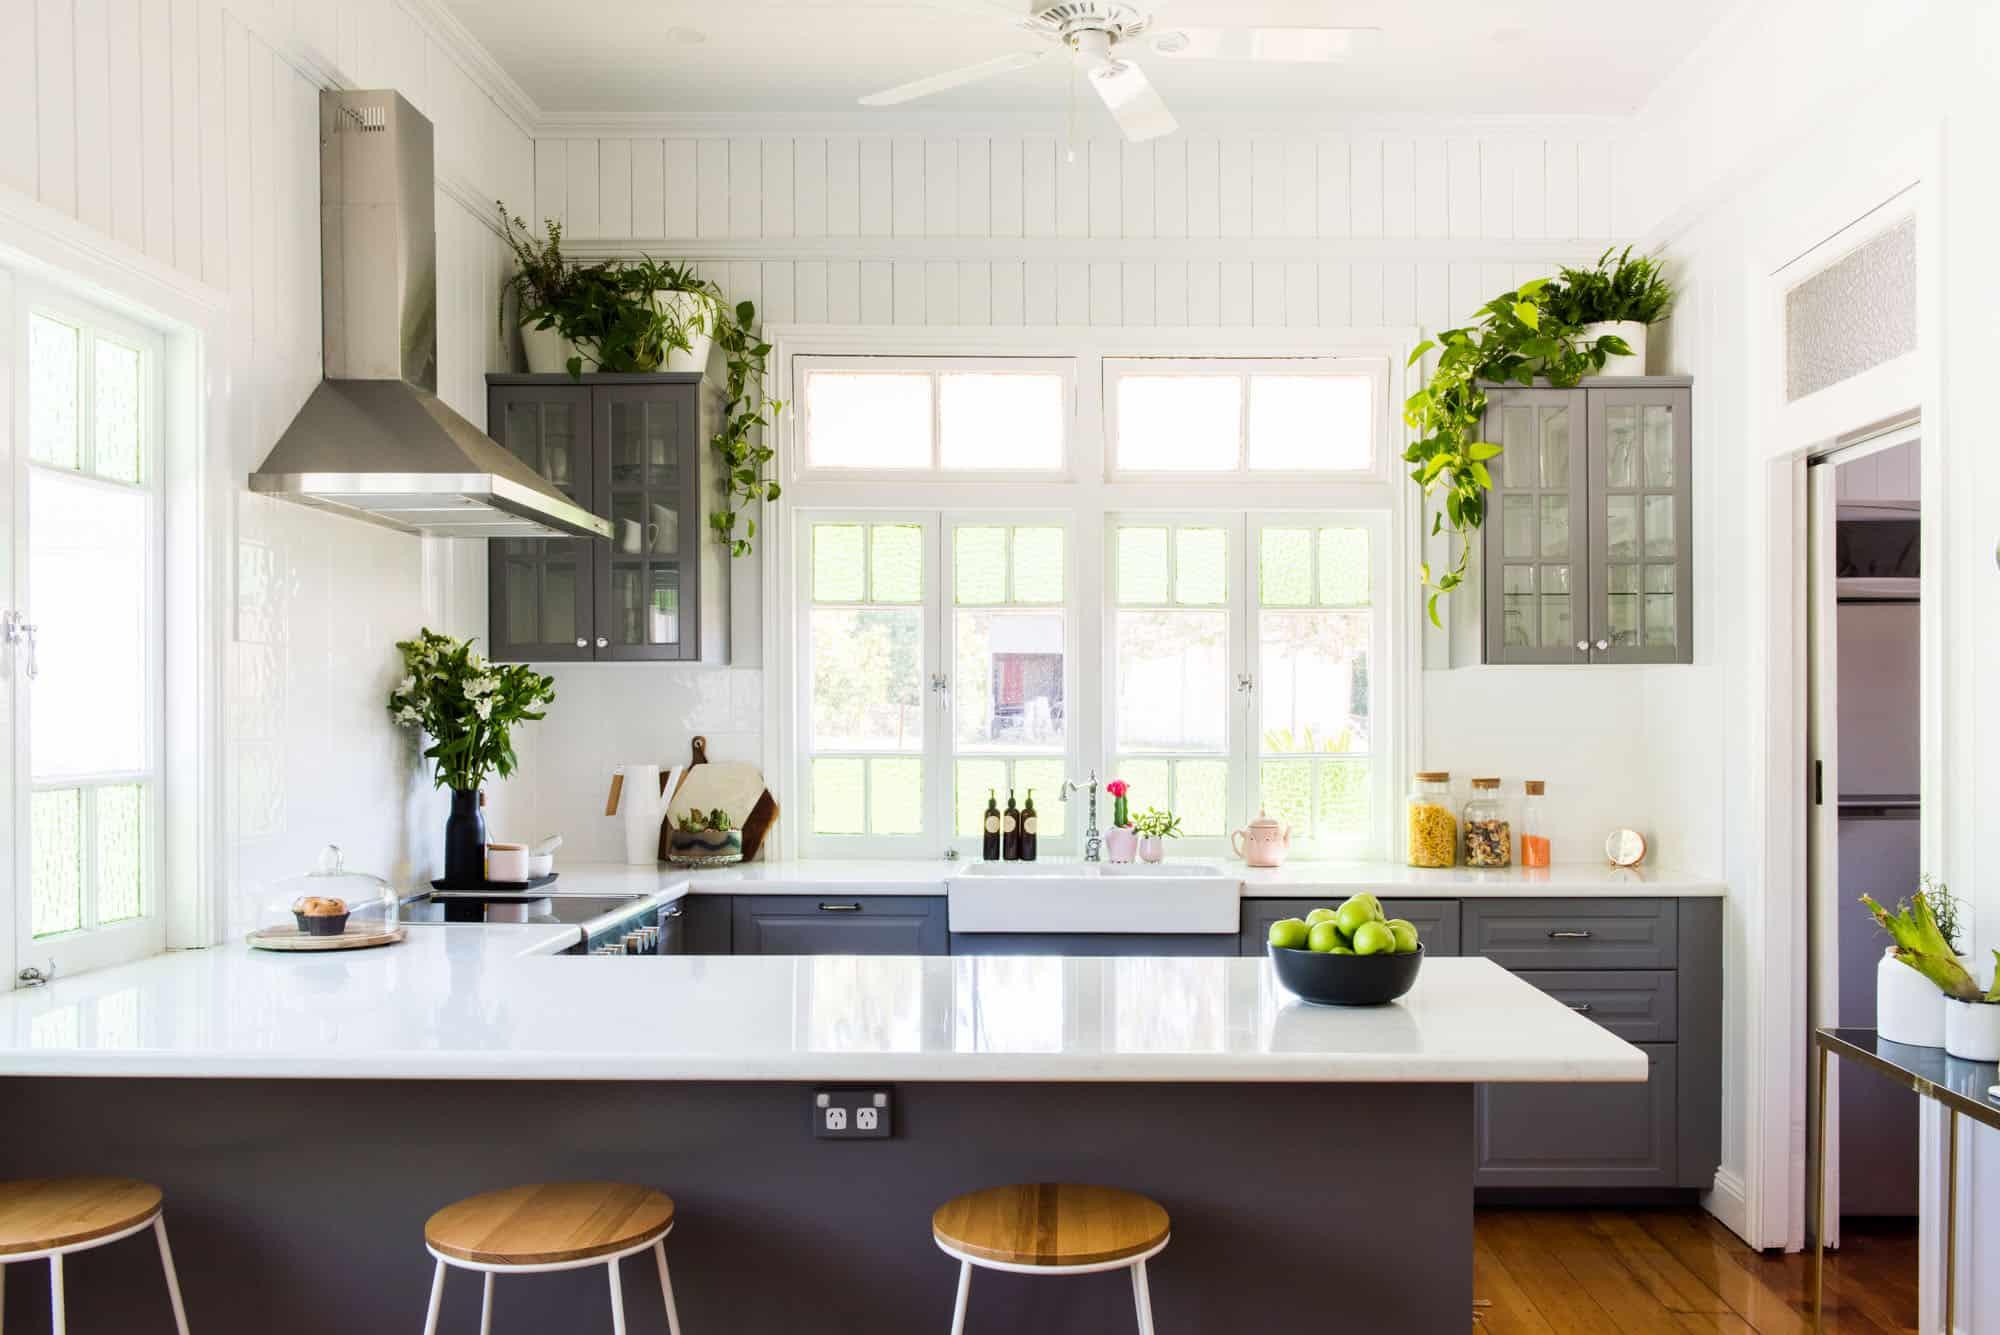 plants on countertops